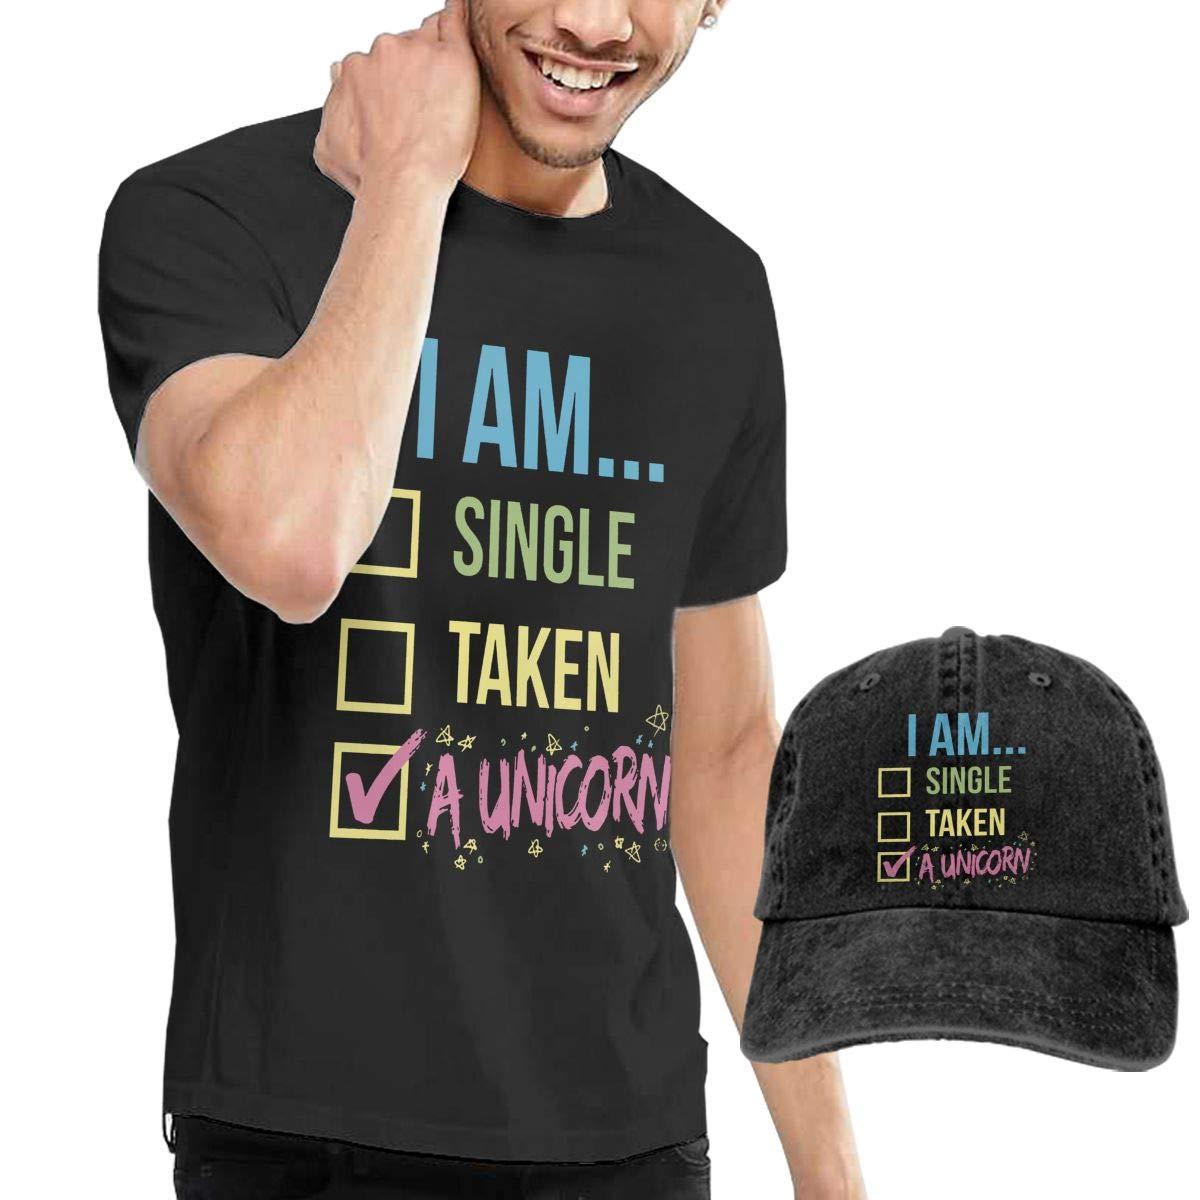 Yiooeea Mens I AM A Unicorn Tshirt and Washed Denim Baseball Dad Hats Black M